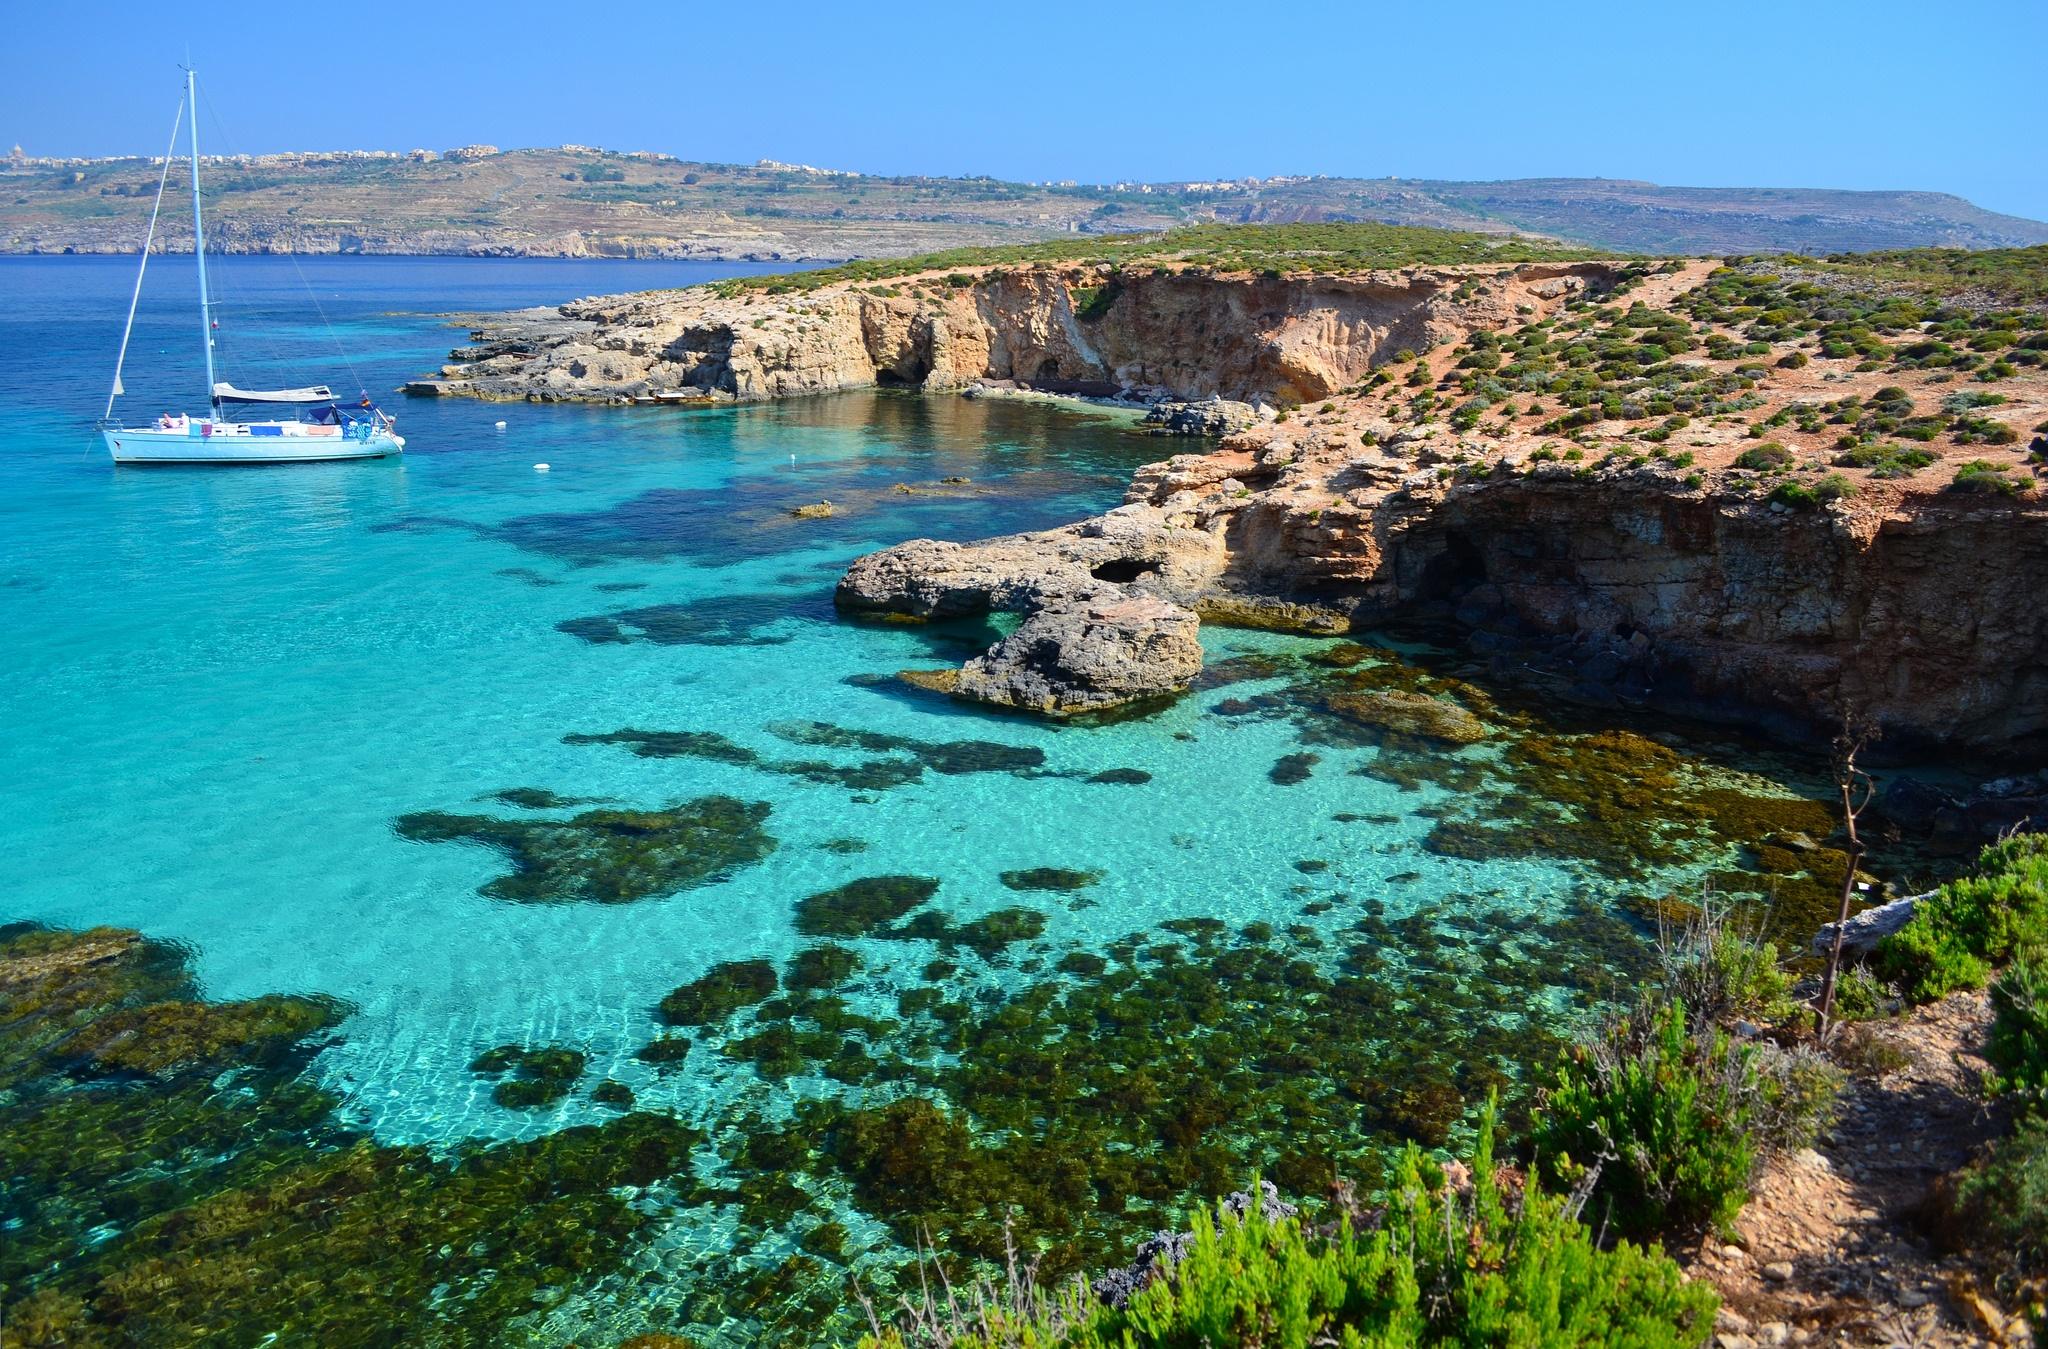 Jugendsprachkurse Malta: Rückblick auf Woche 3&4